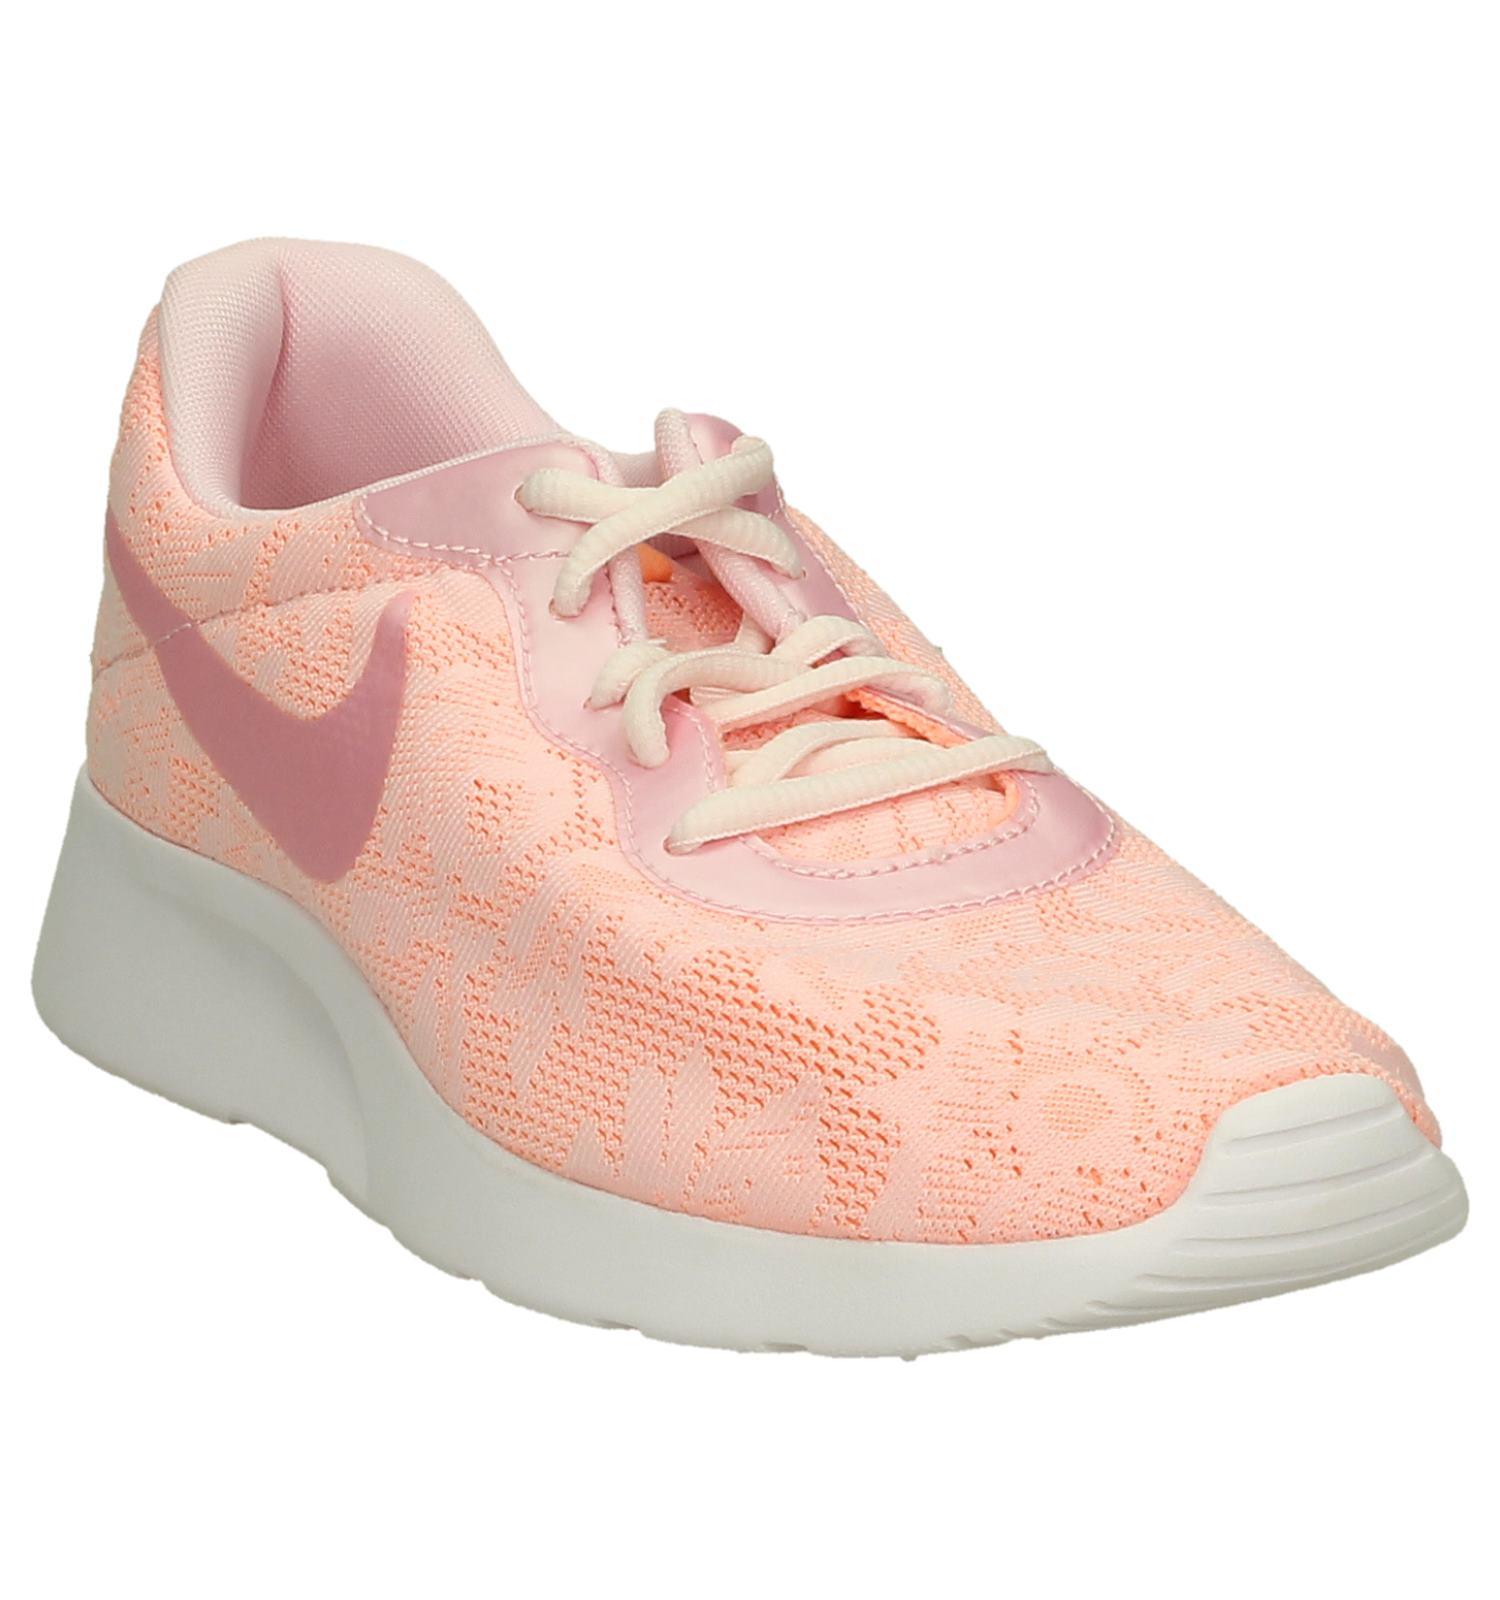 be5bdf4d813 Roze Sneaker Runner Nike Tanjun | TORFS.BE | Gratis verzend en retour